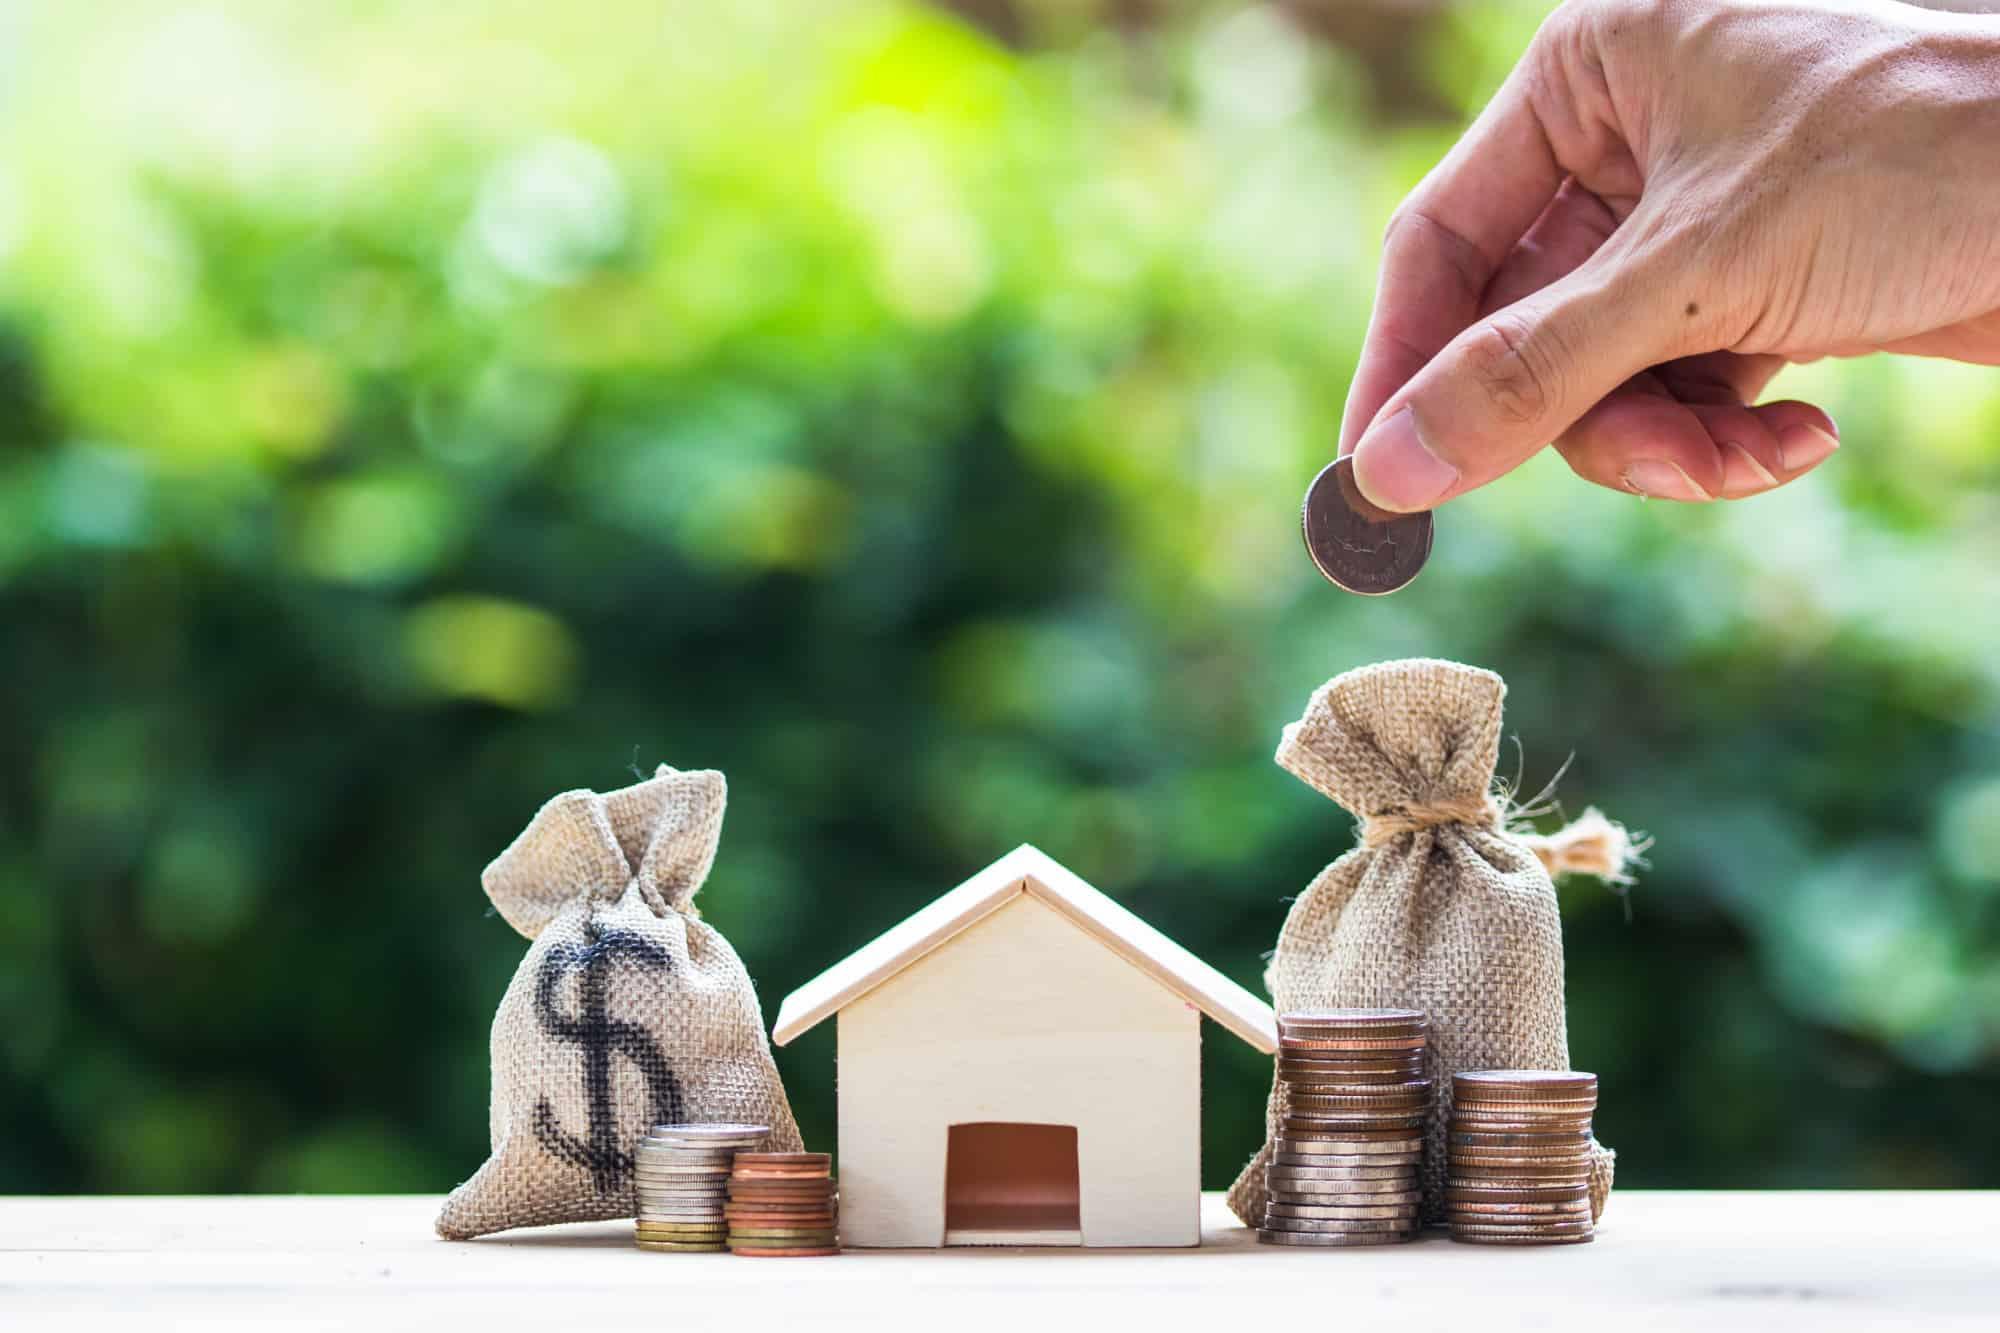 Home Equity Loans - No Job Verification Canada